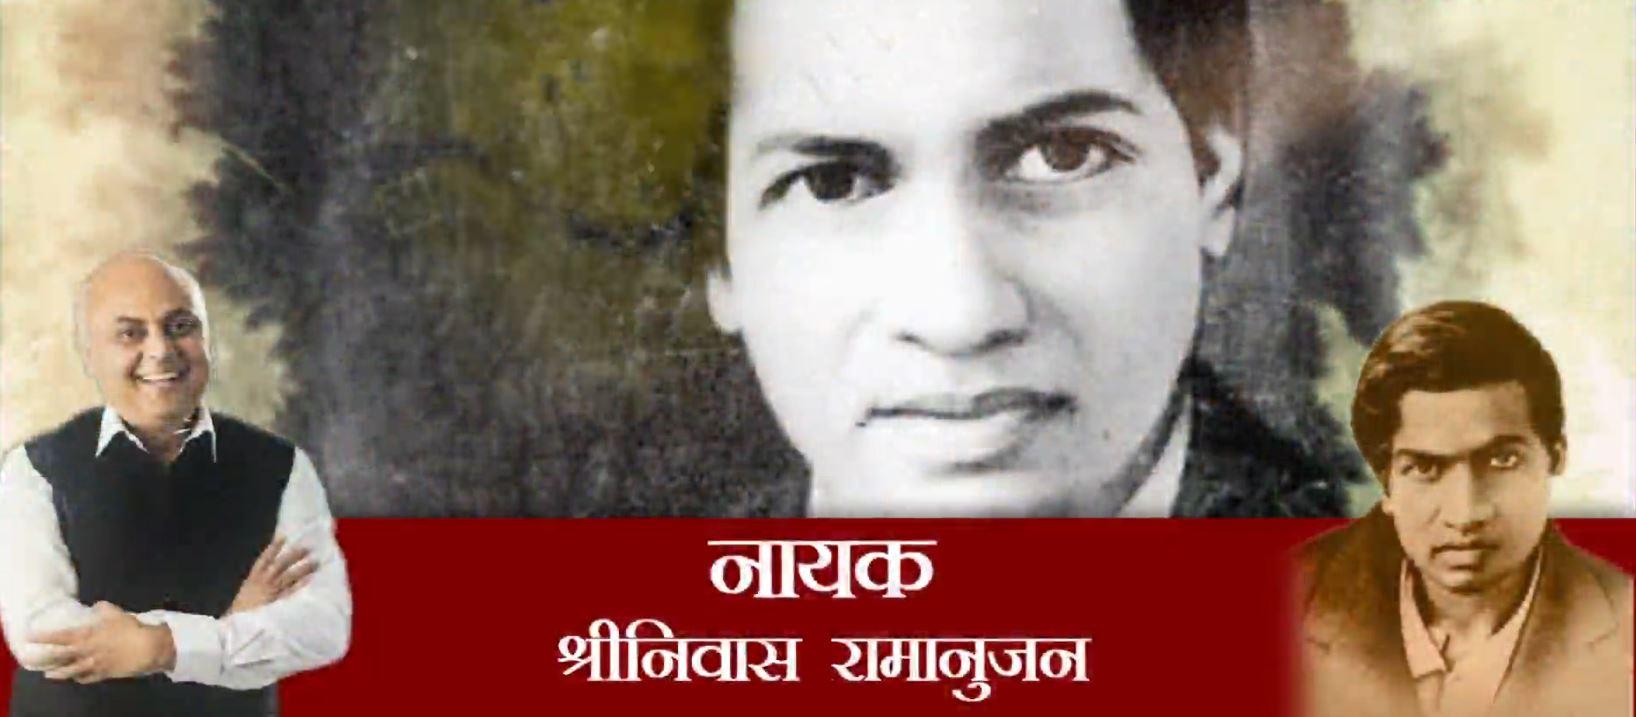 Srinivasa Ramanujan Death Anniversary, Mathematician Ramanujan, Mathematician Srinivasa Ramanujan, श्रीनिवास रामानुजन, गणितज्ञ श्रीनिवास रामानुजन